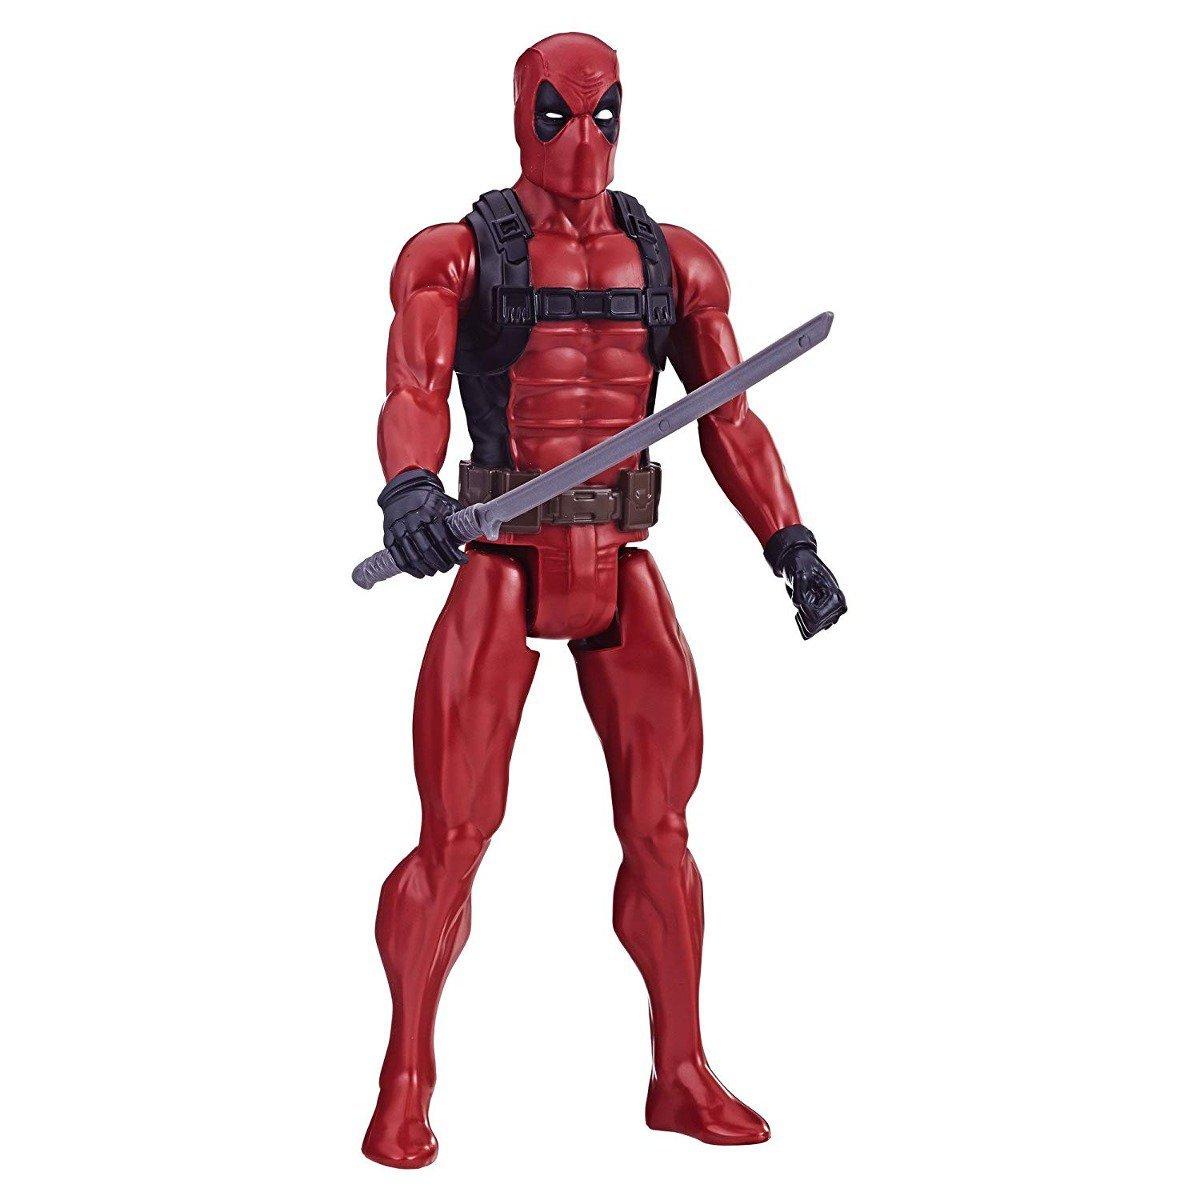 Boneco Deadpool 30 Cm Marvel - Hasbro E2933